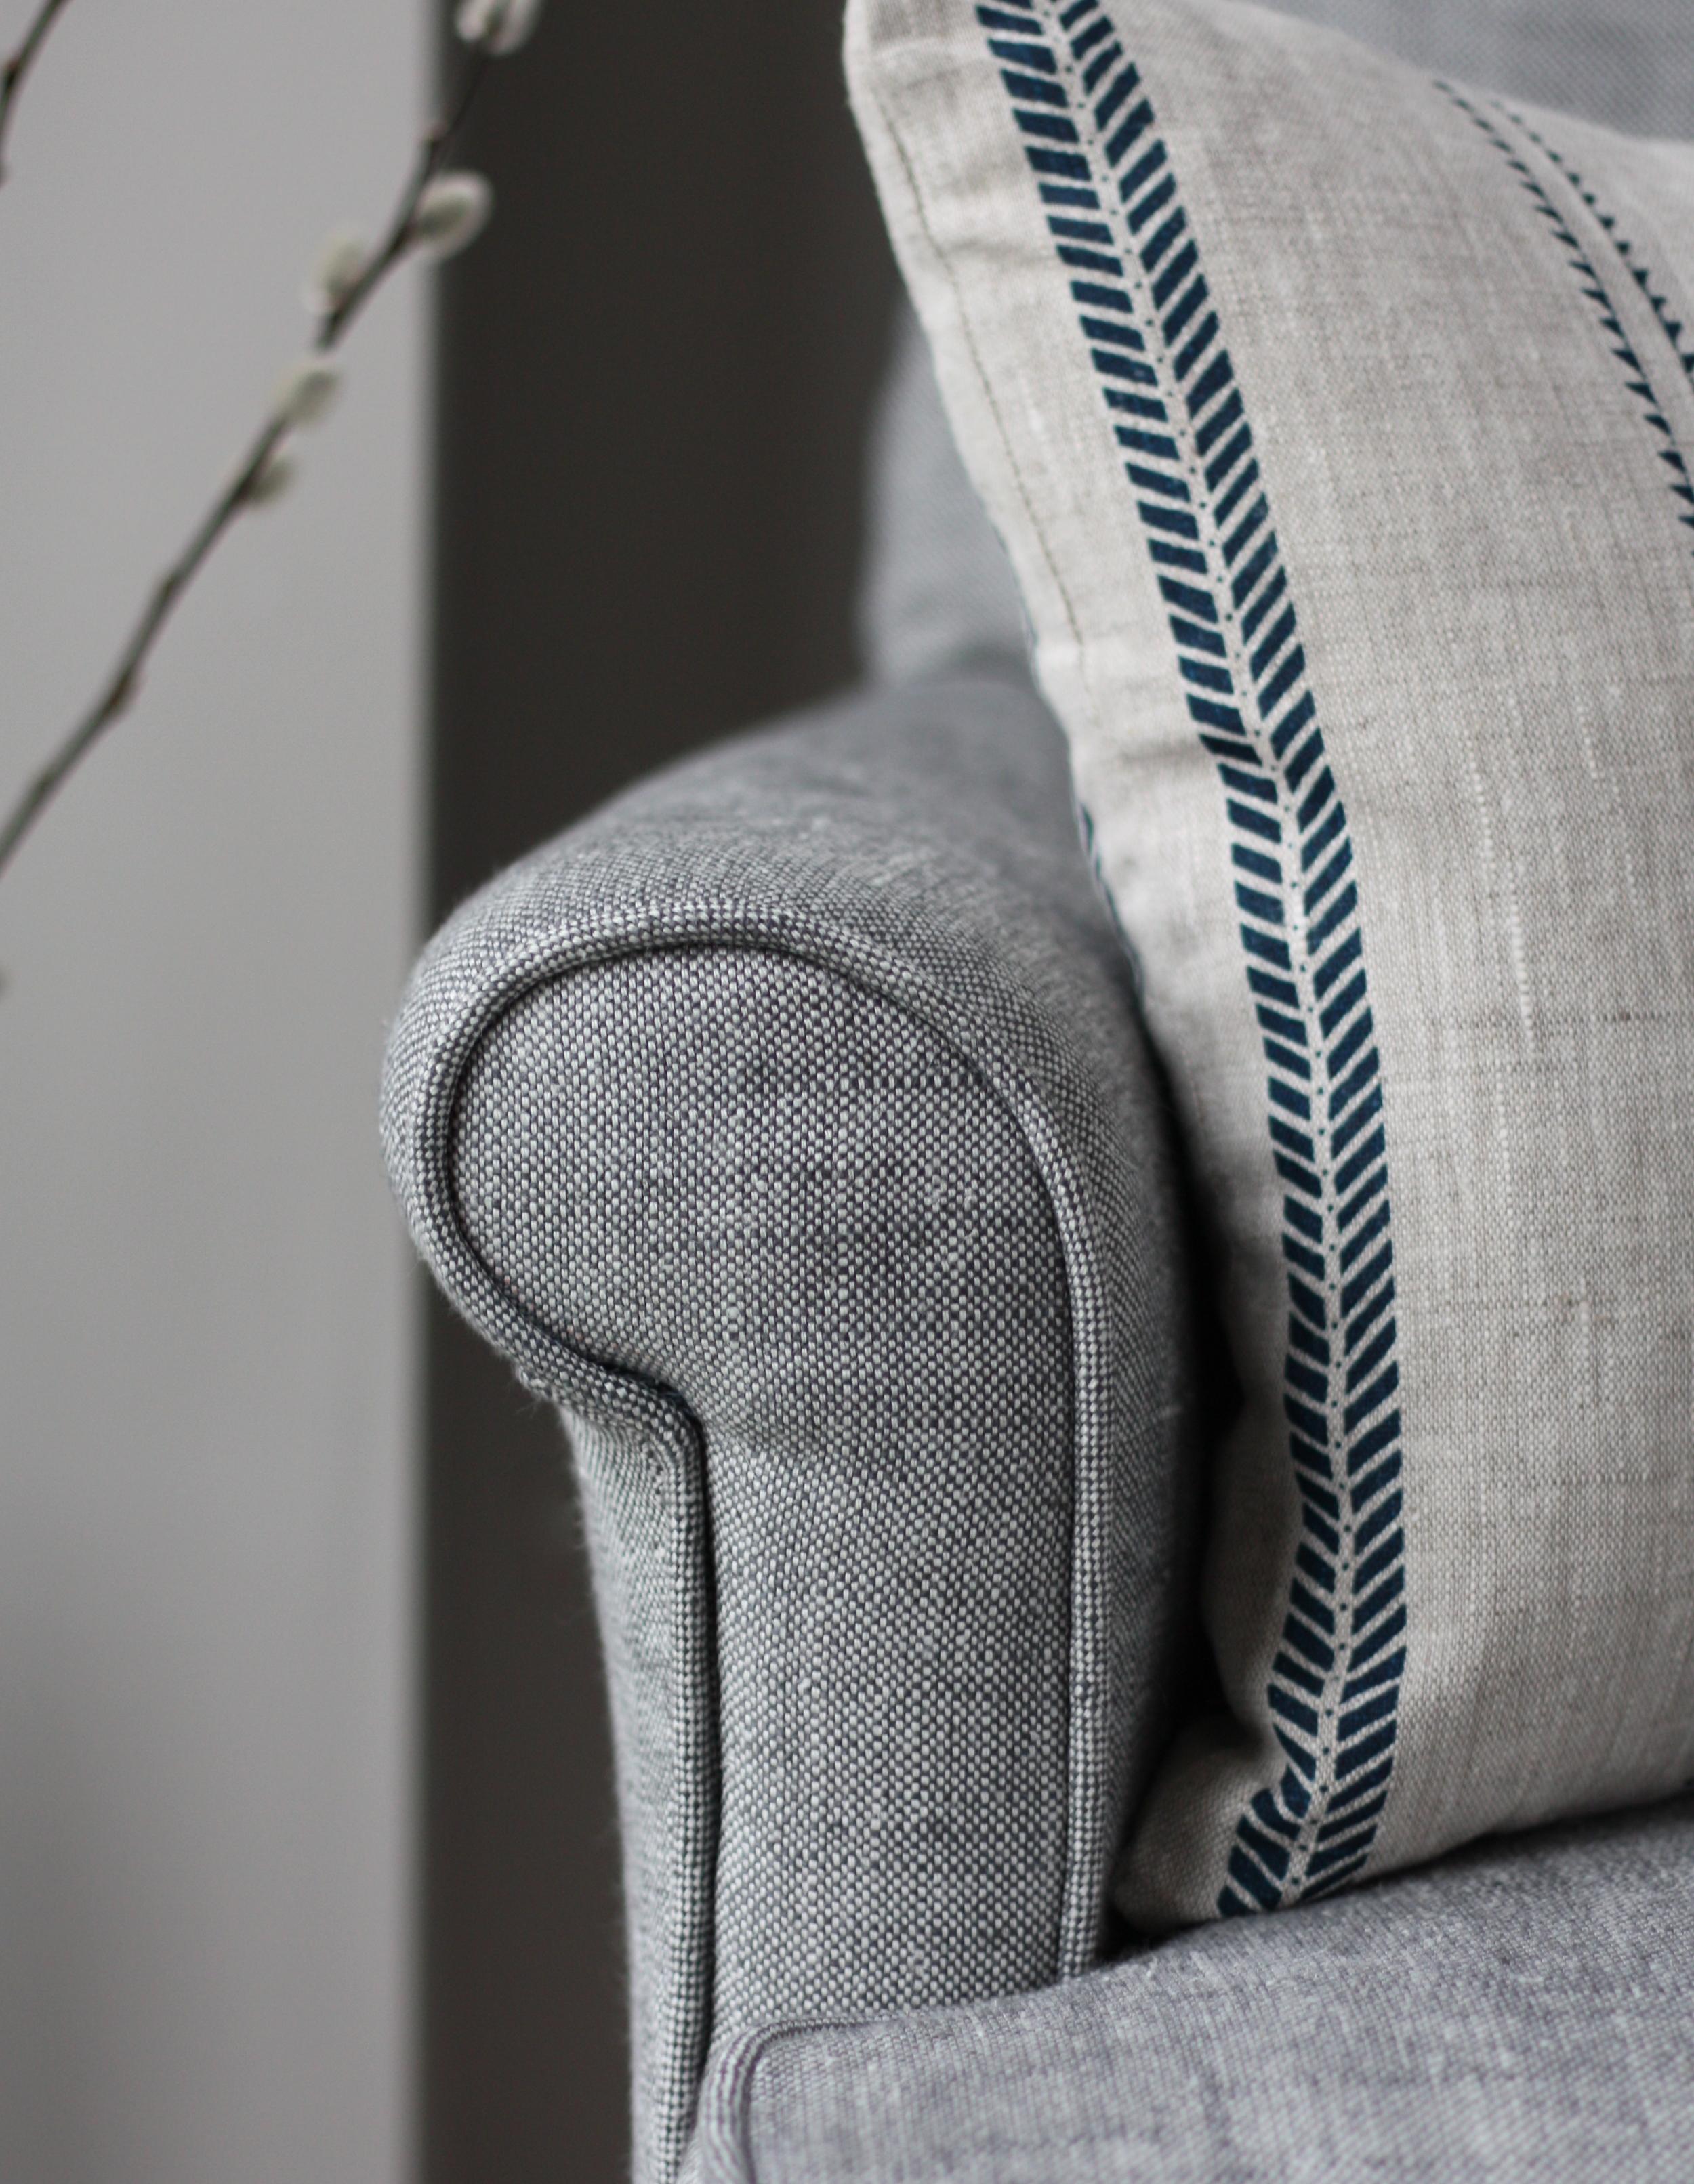 Plain Grey Linen Woven Fabric Zoe Glencross